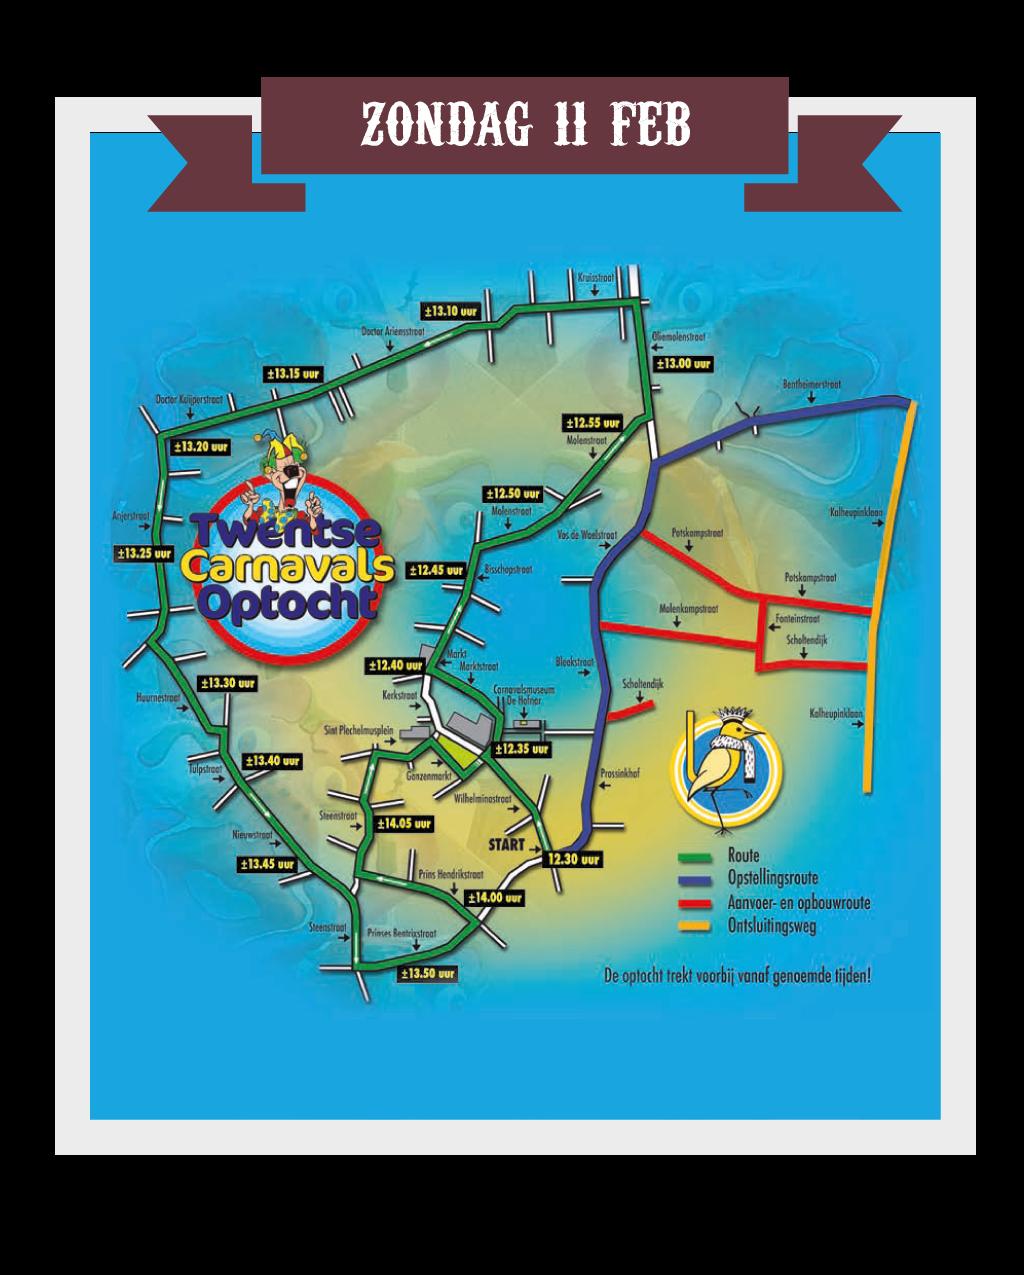 Route Grote Twentse carnavalsoptocht 2018